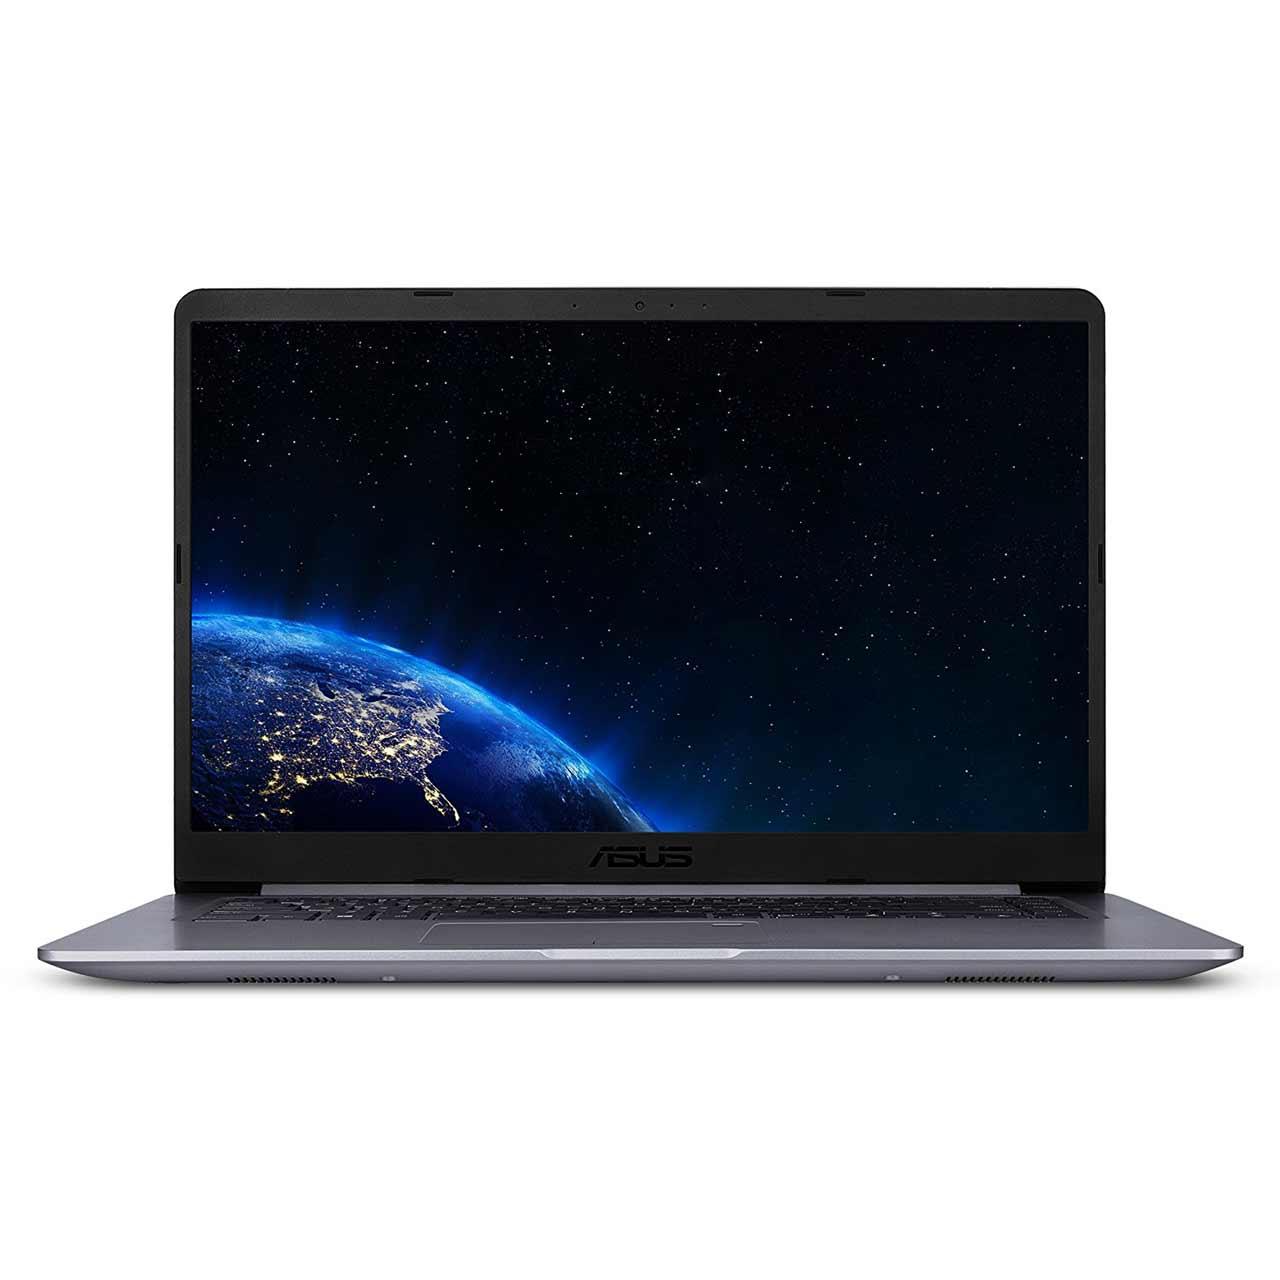 "Asus VivoBook Slim 14"" | 8th Gen i5 - 8250u | 8GB RAM | 128GB SSD | £499 @ AO"